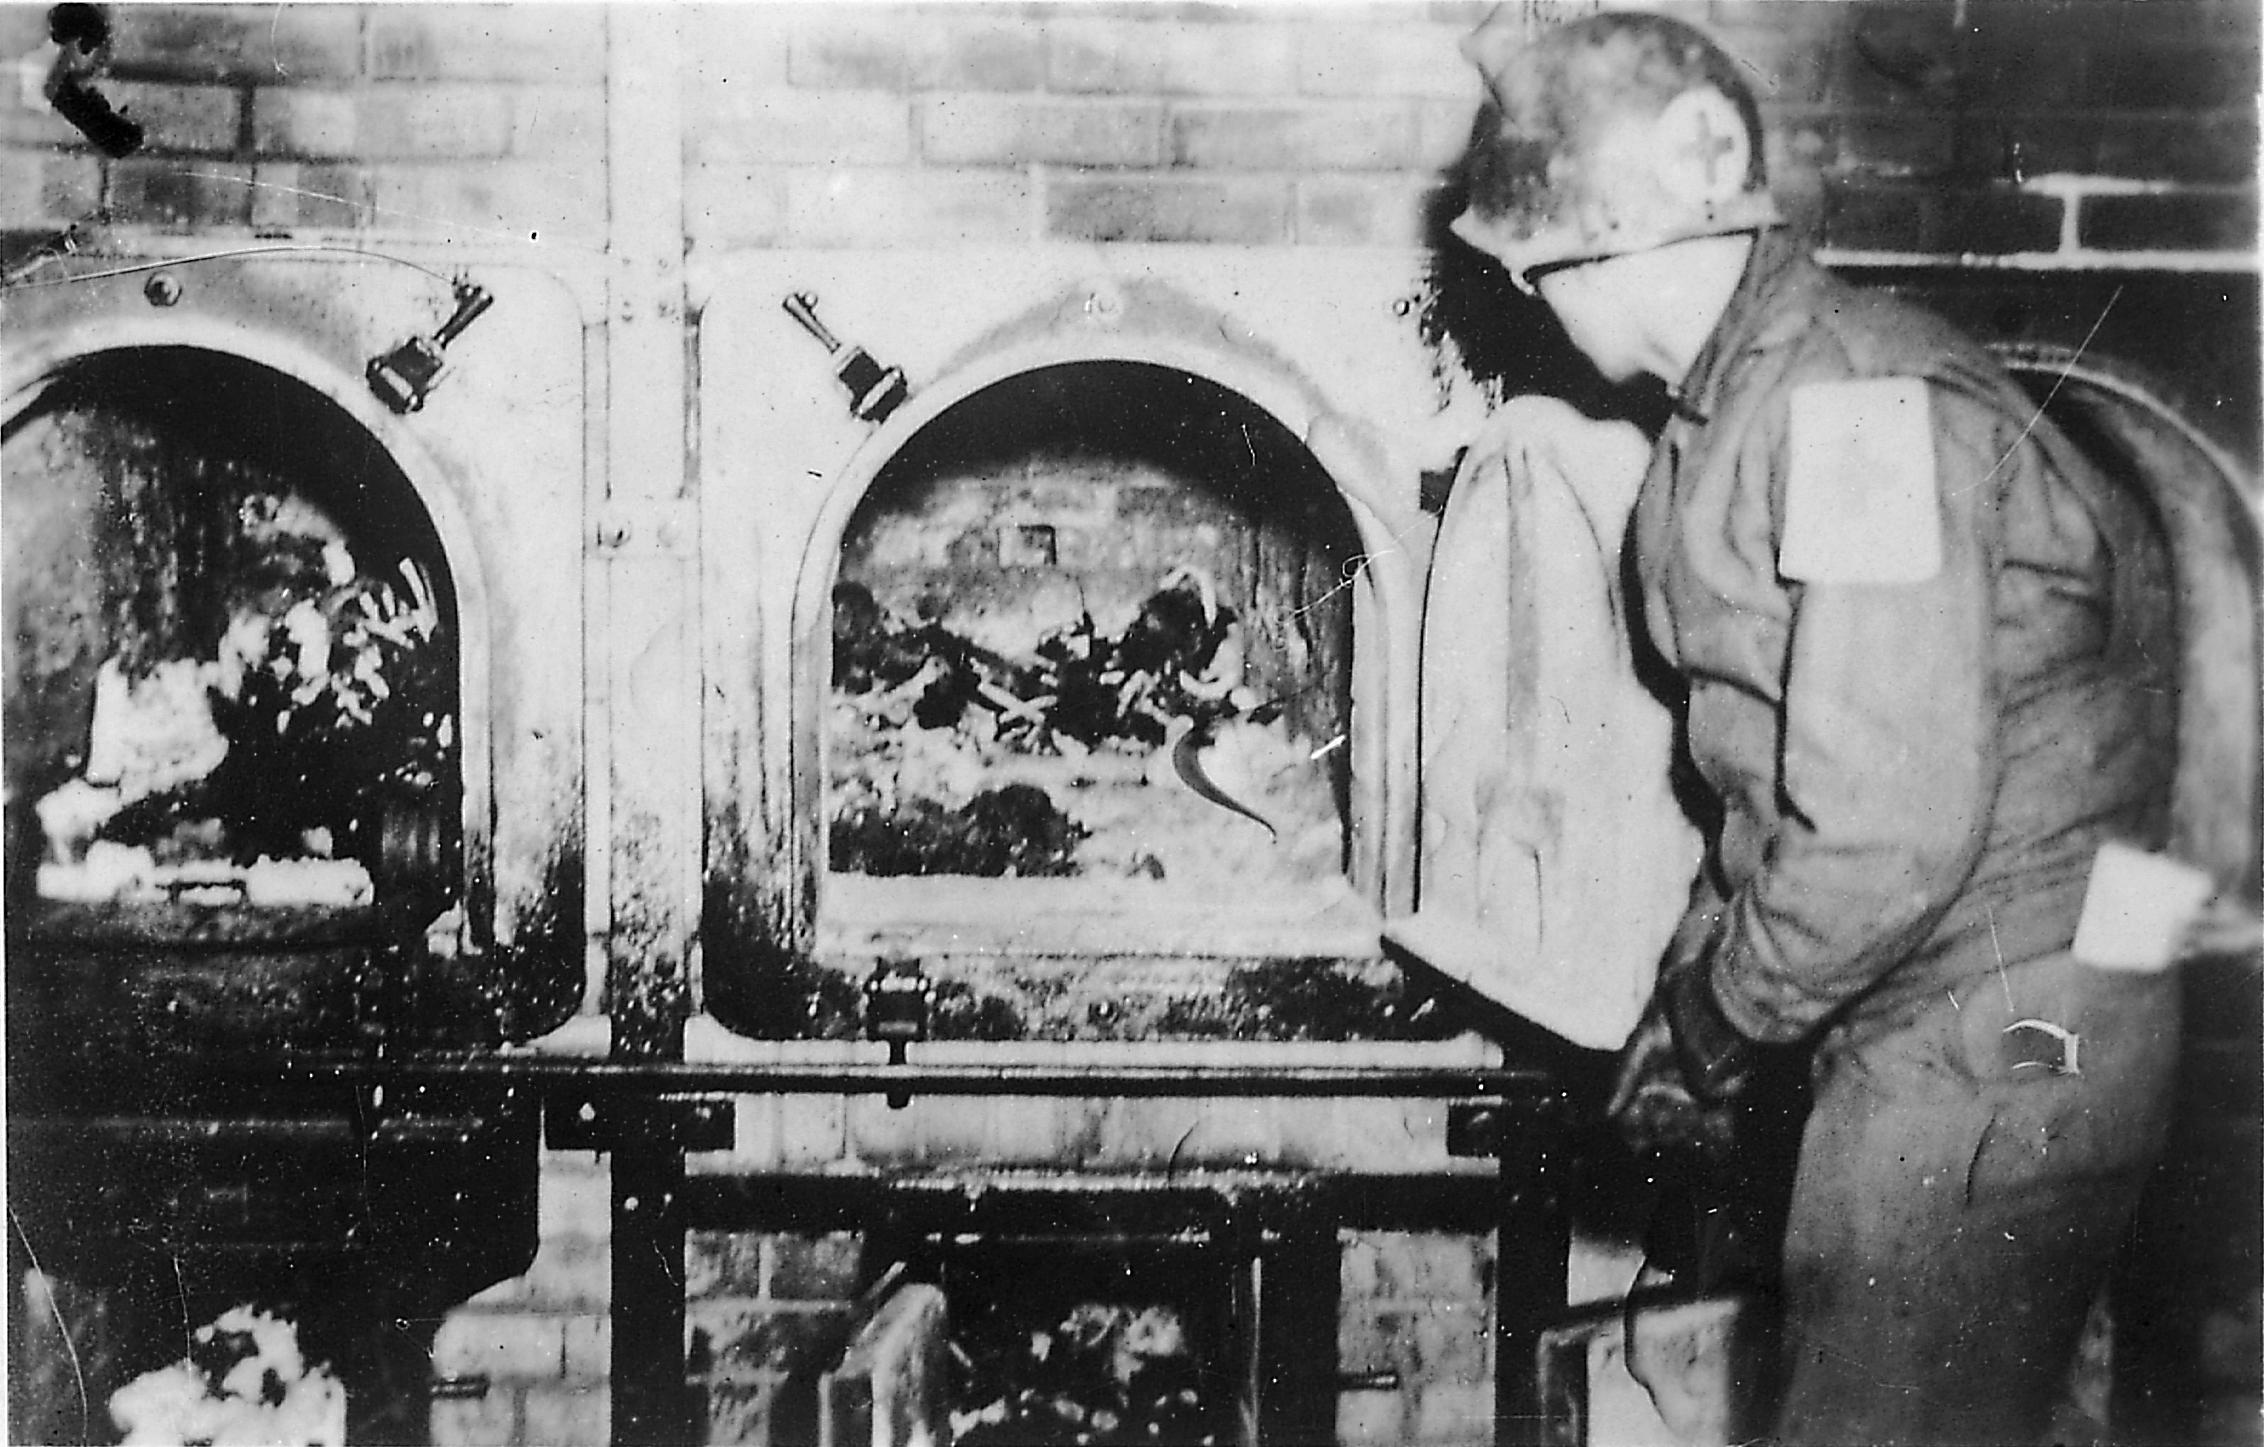 Пытки японцев фото 19 фотография